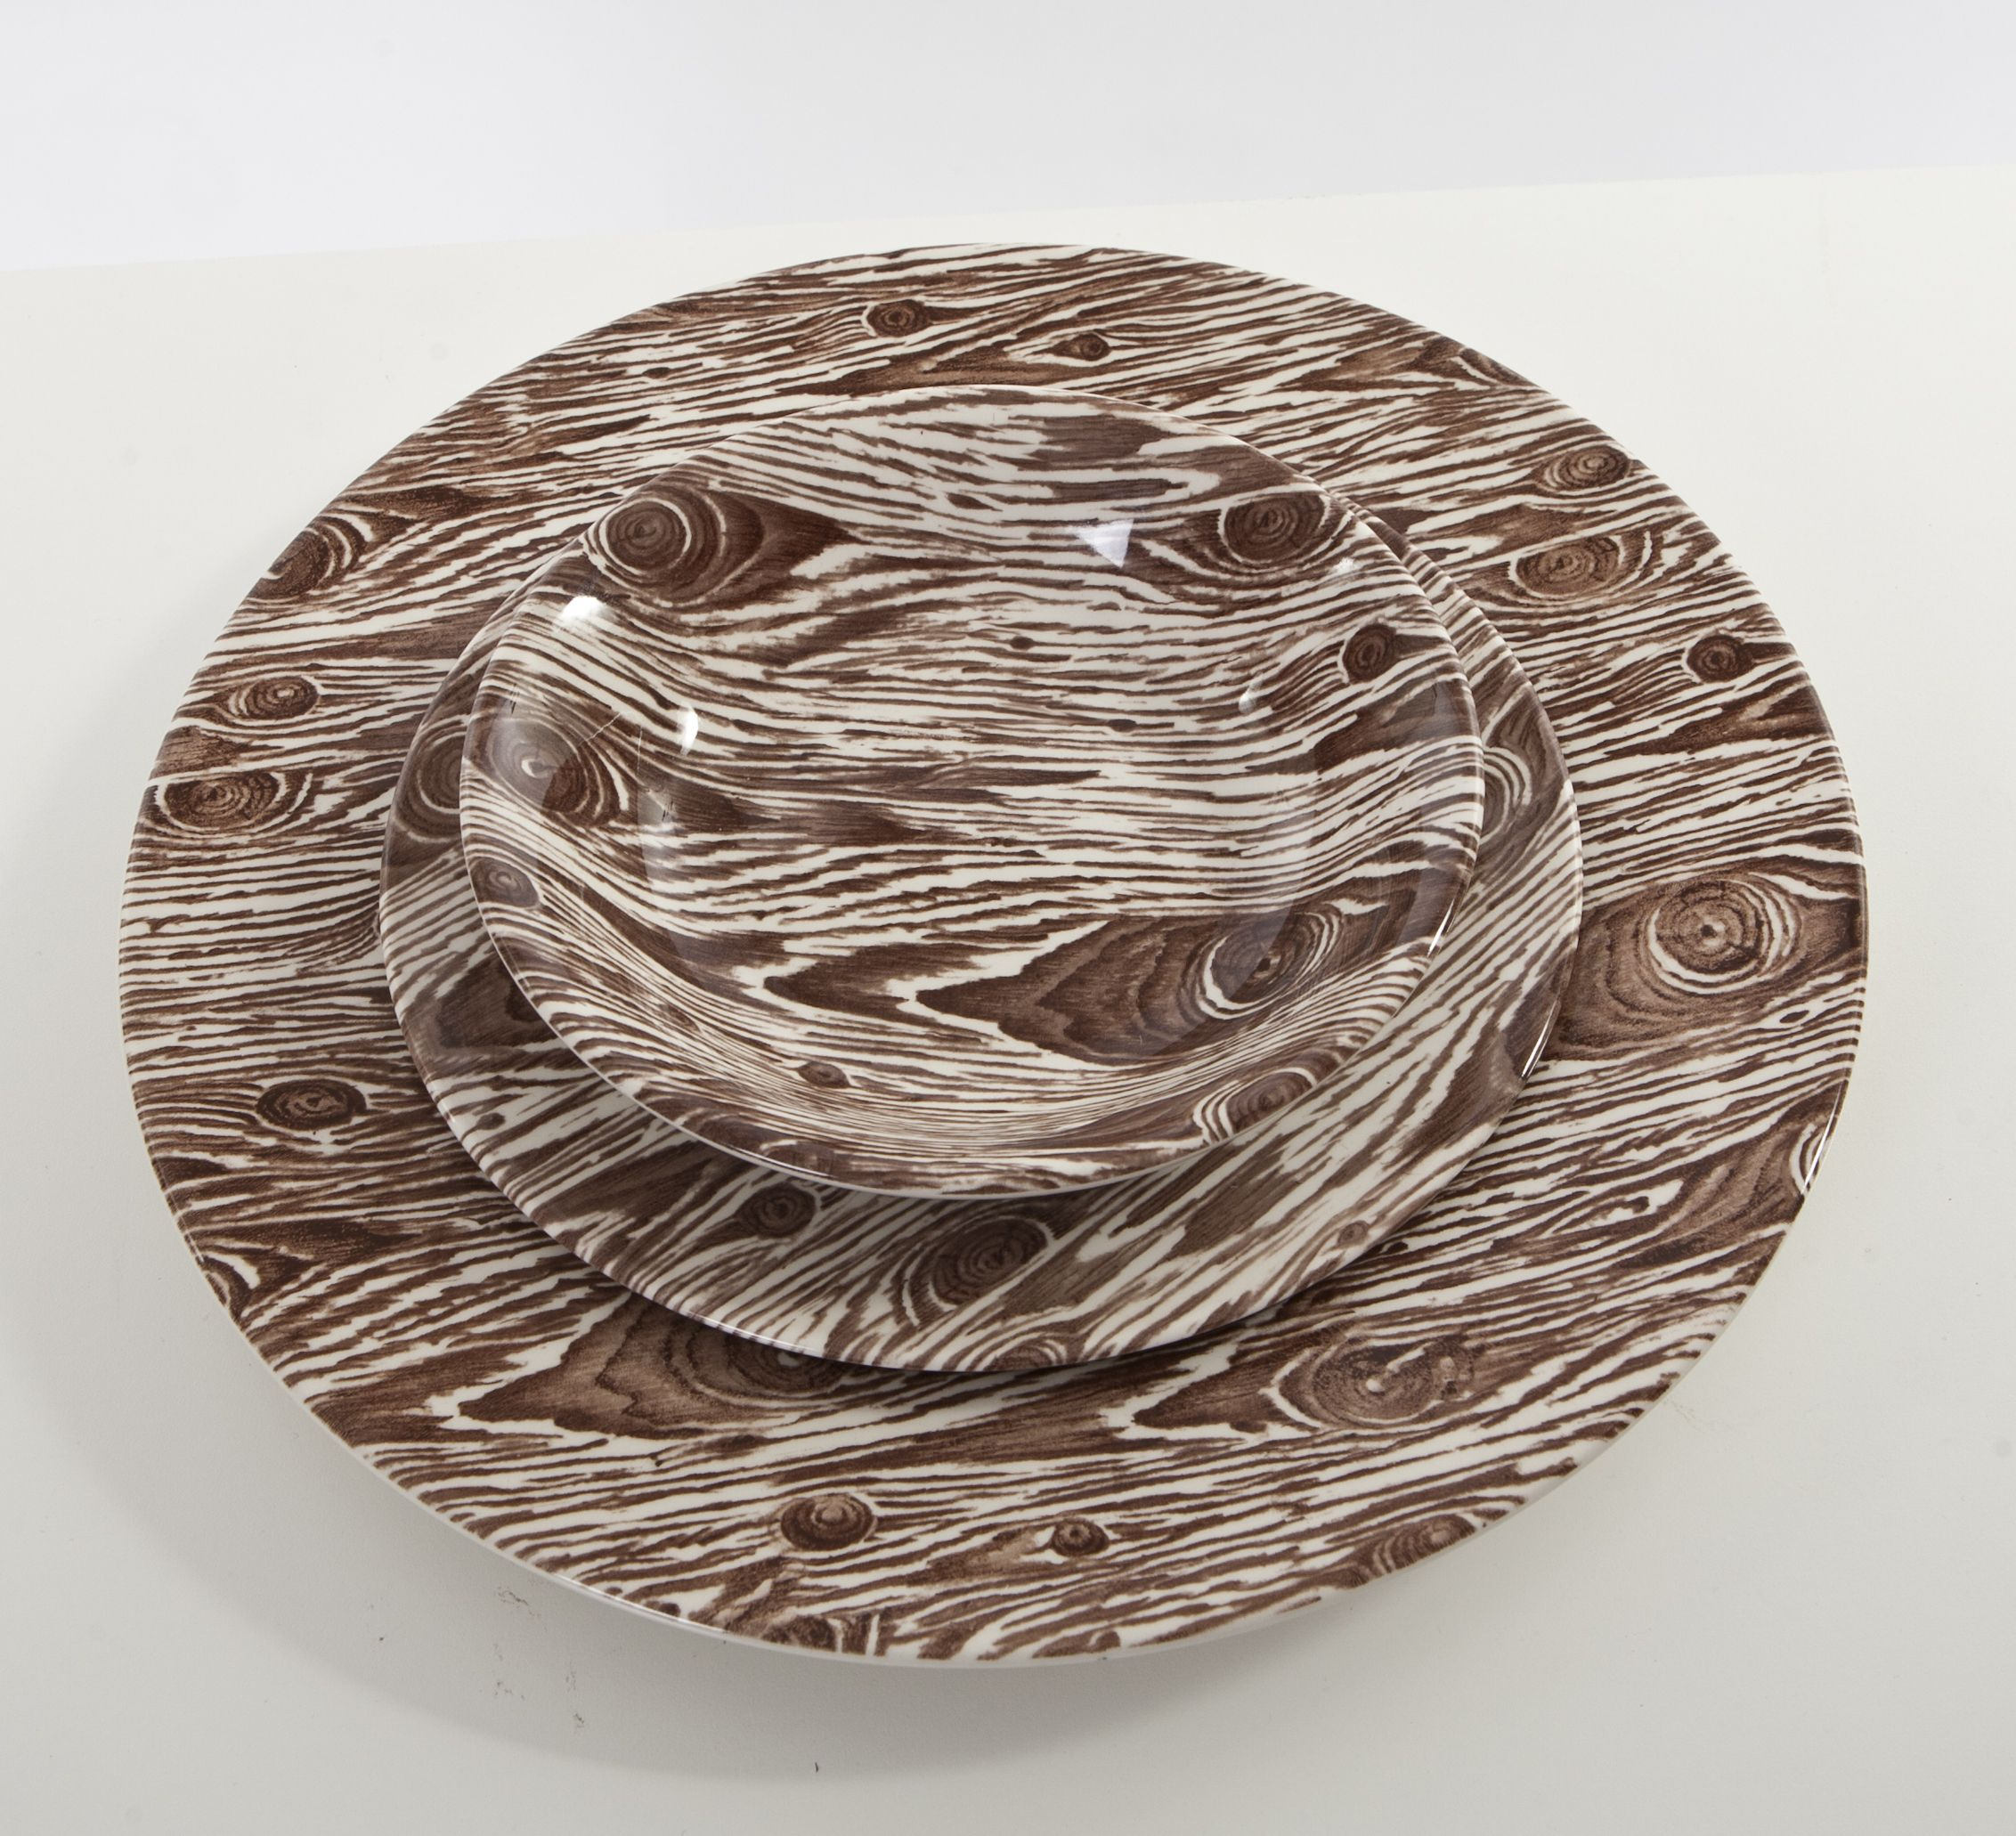 Ross Sveback Faux Bois Tabletop Collection China Patterns Ii  # Bois En Chaene